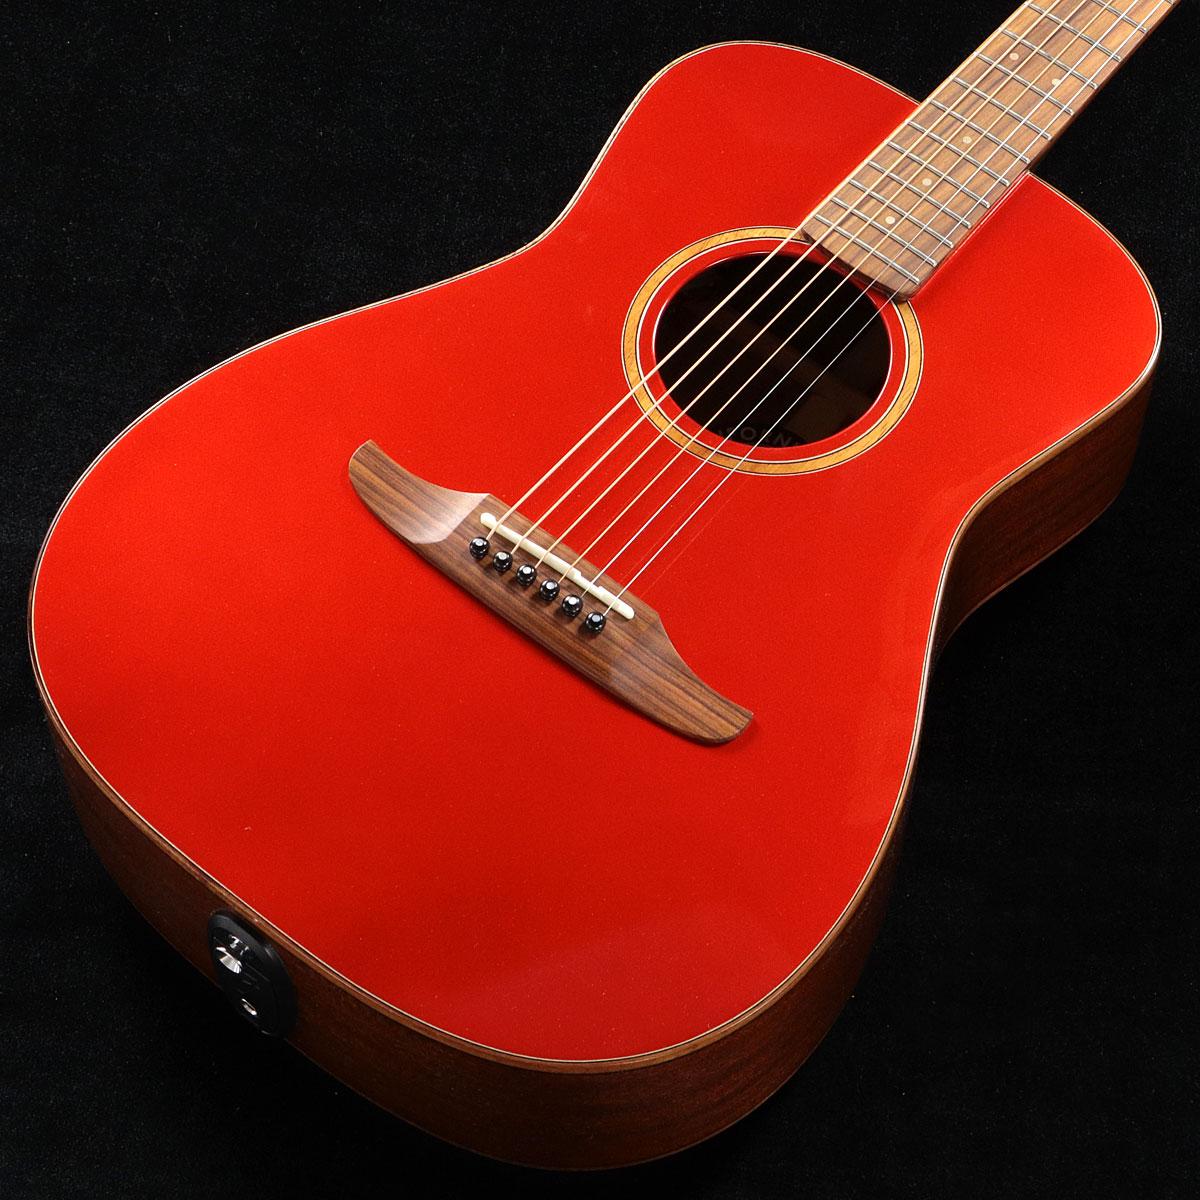 Fender / Malibu Classic Hot Rod Red Metallic (HRM) 【CALIFORNIA SERIES】フェンダー アコースティックギター【渋谷店】